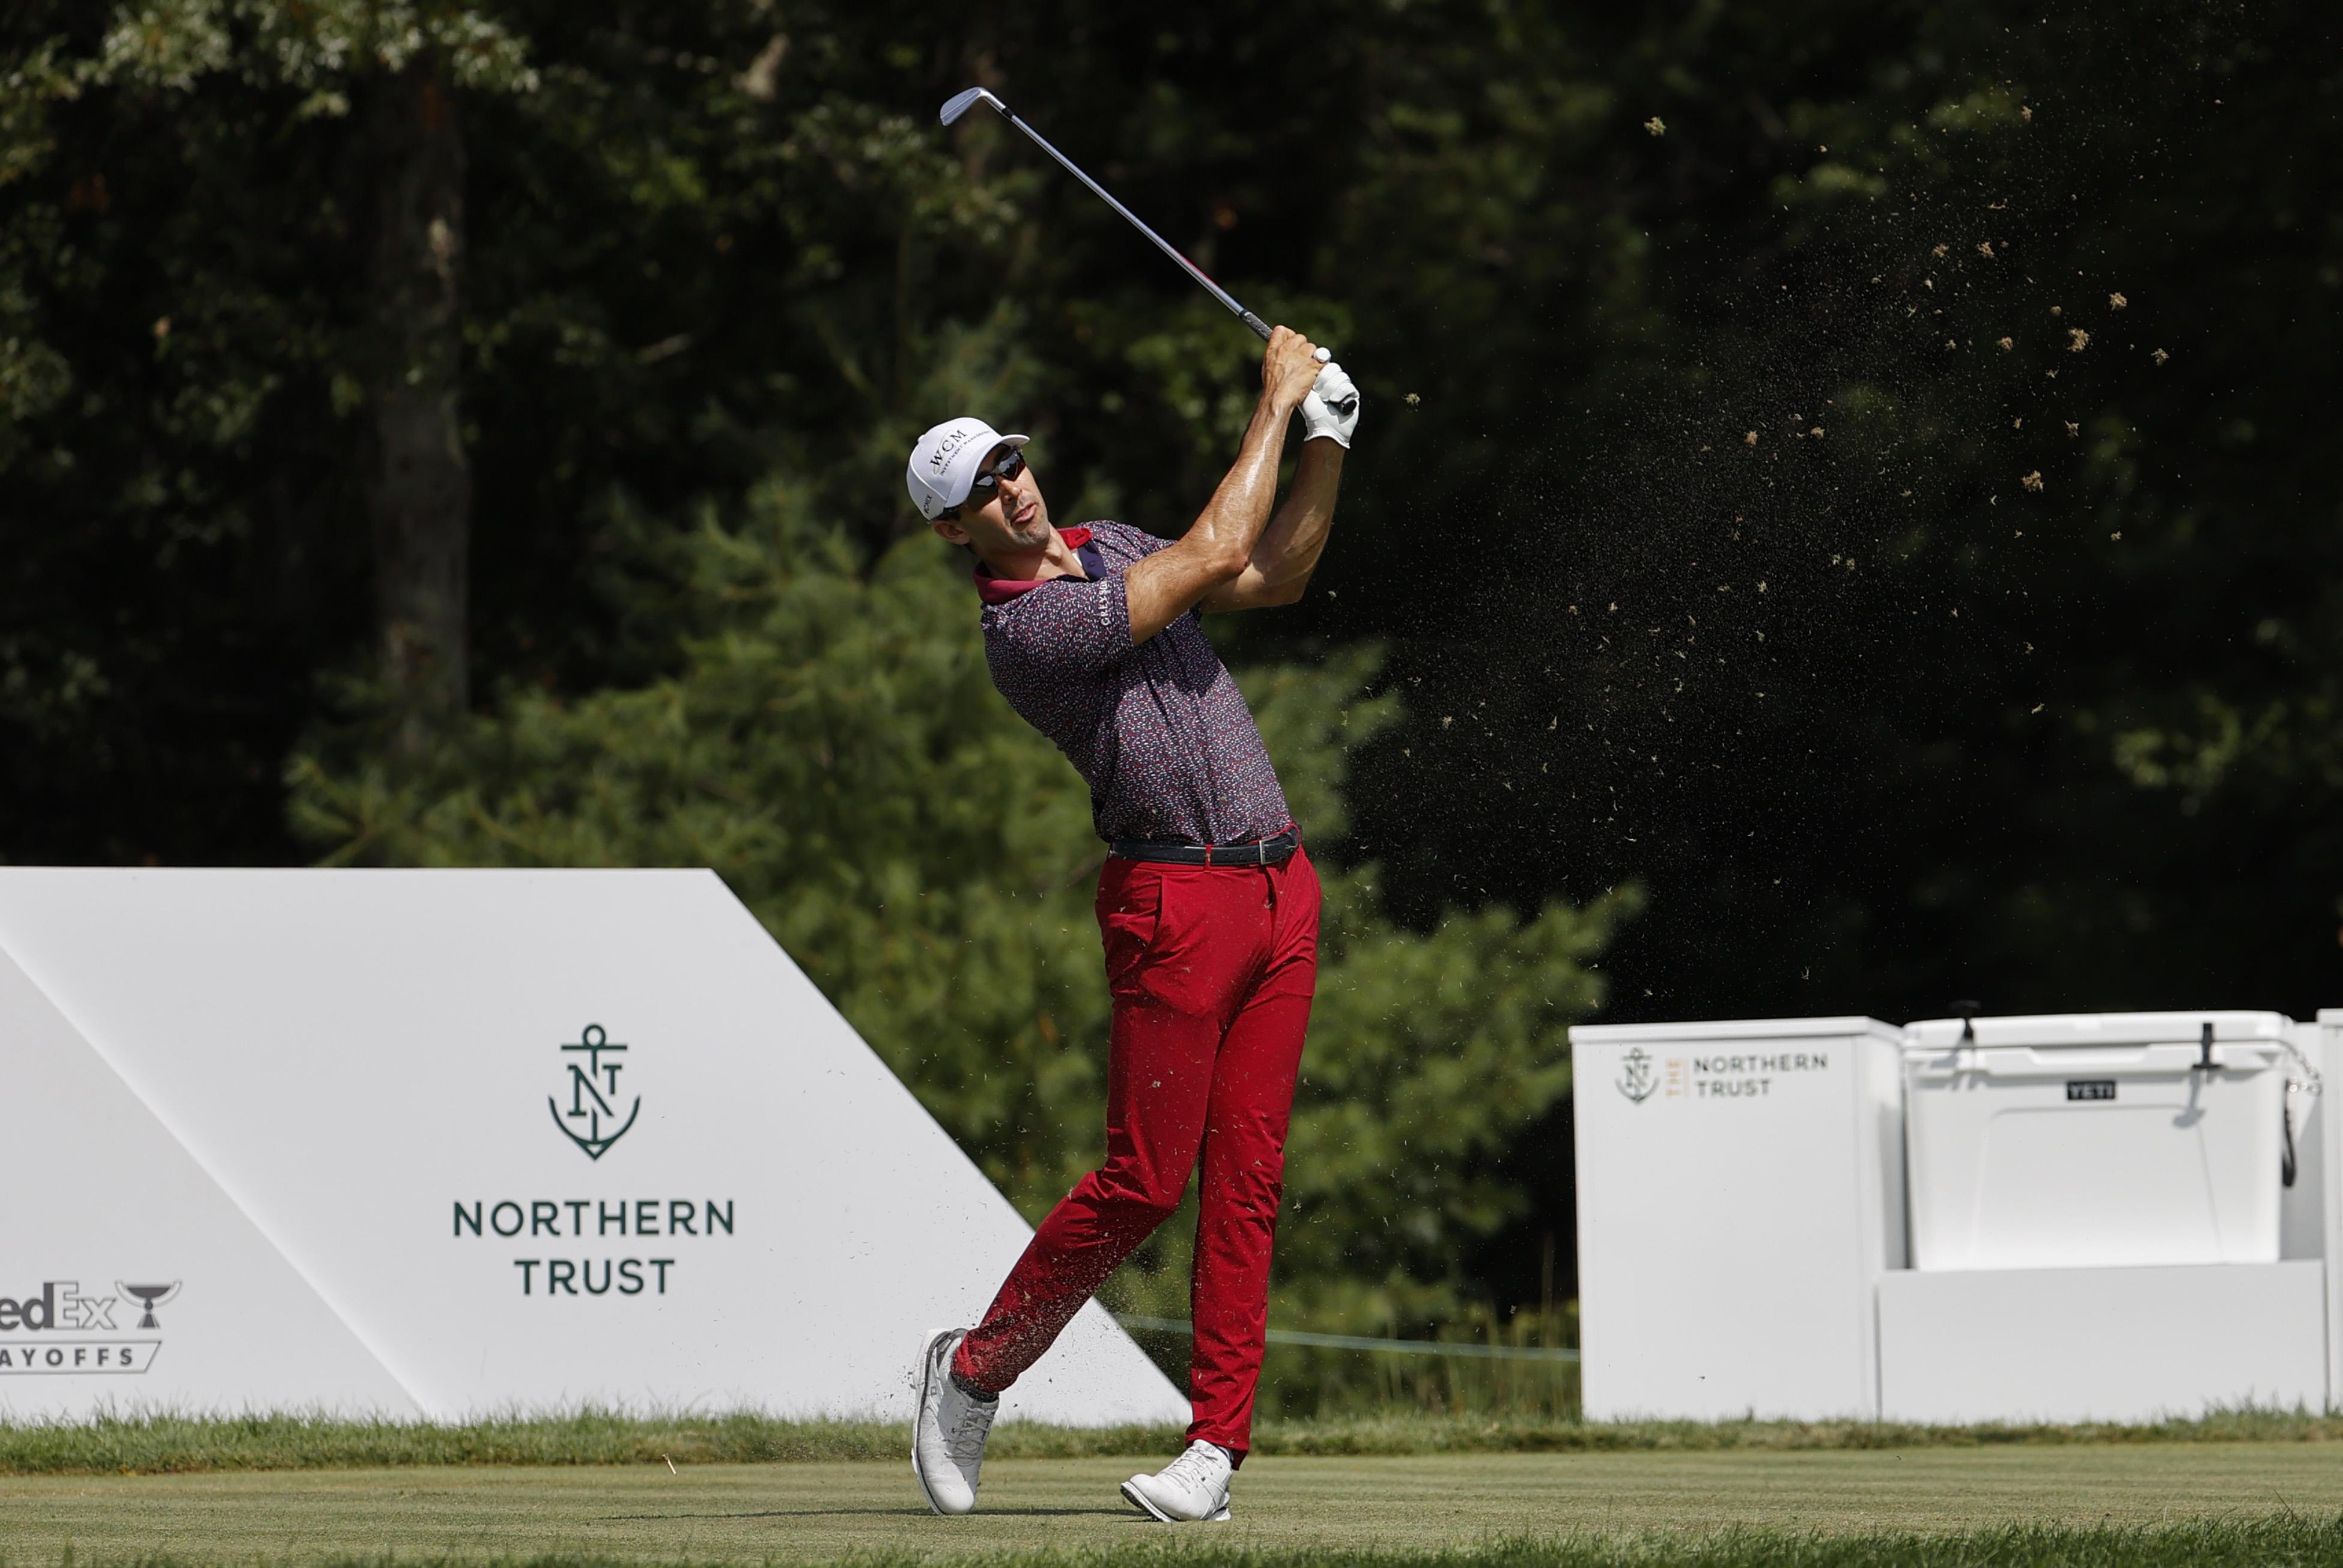 GOLF: AUG 22 PGA - The Northern Trust